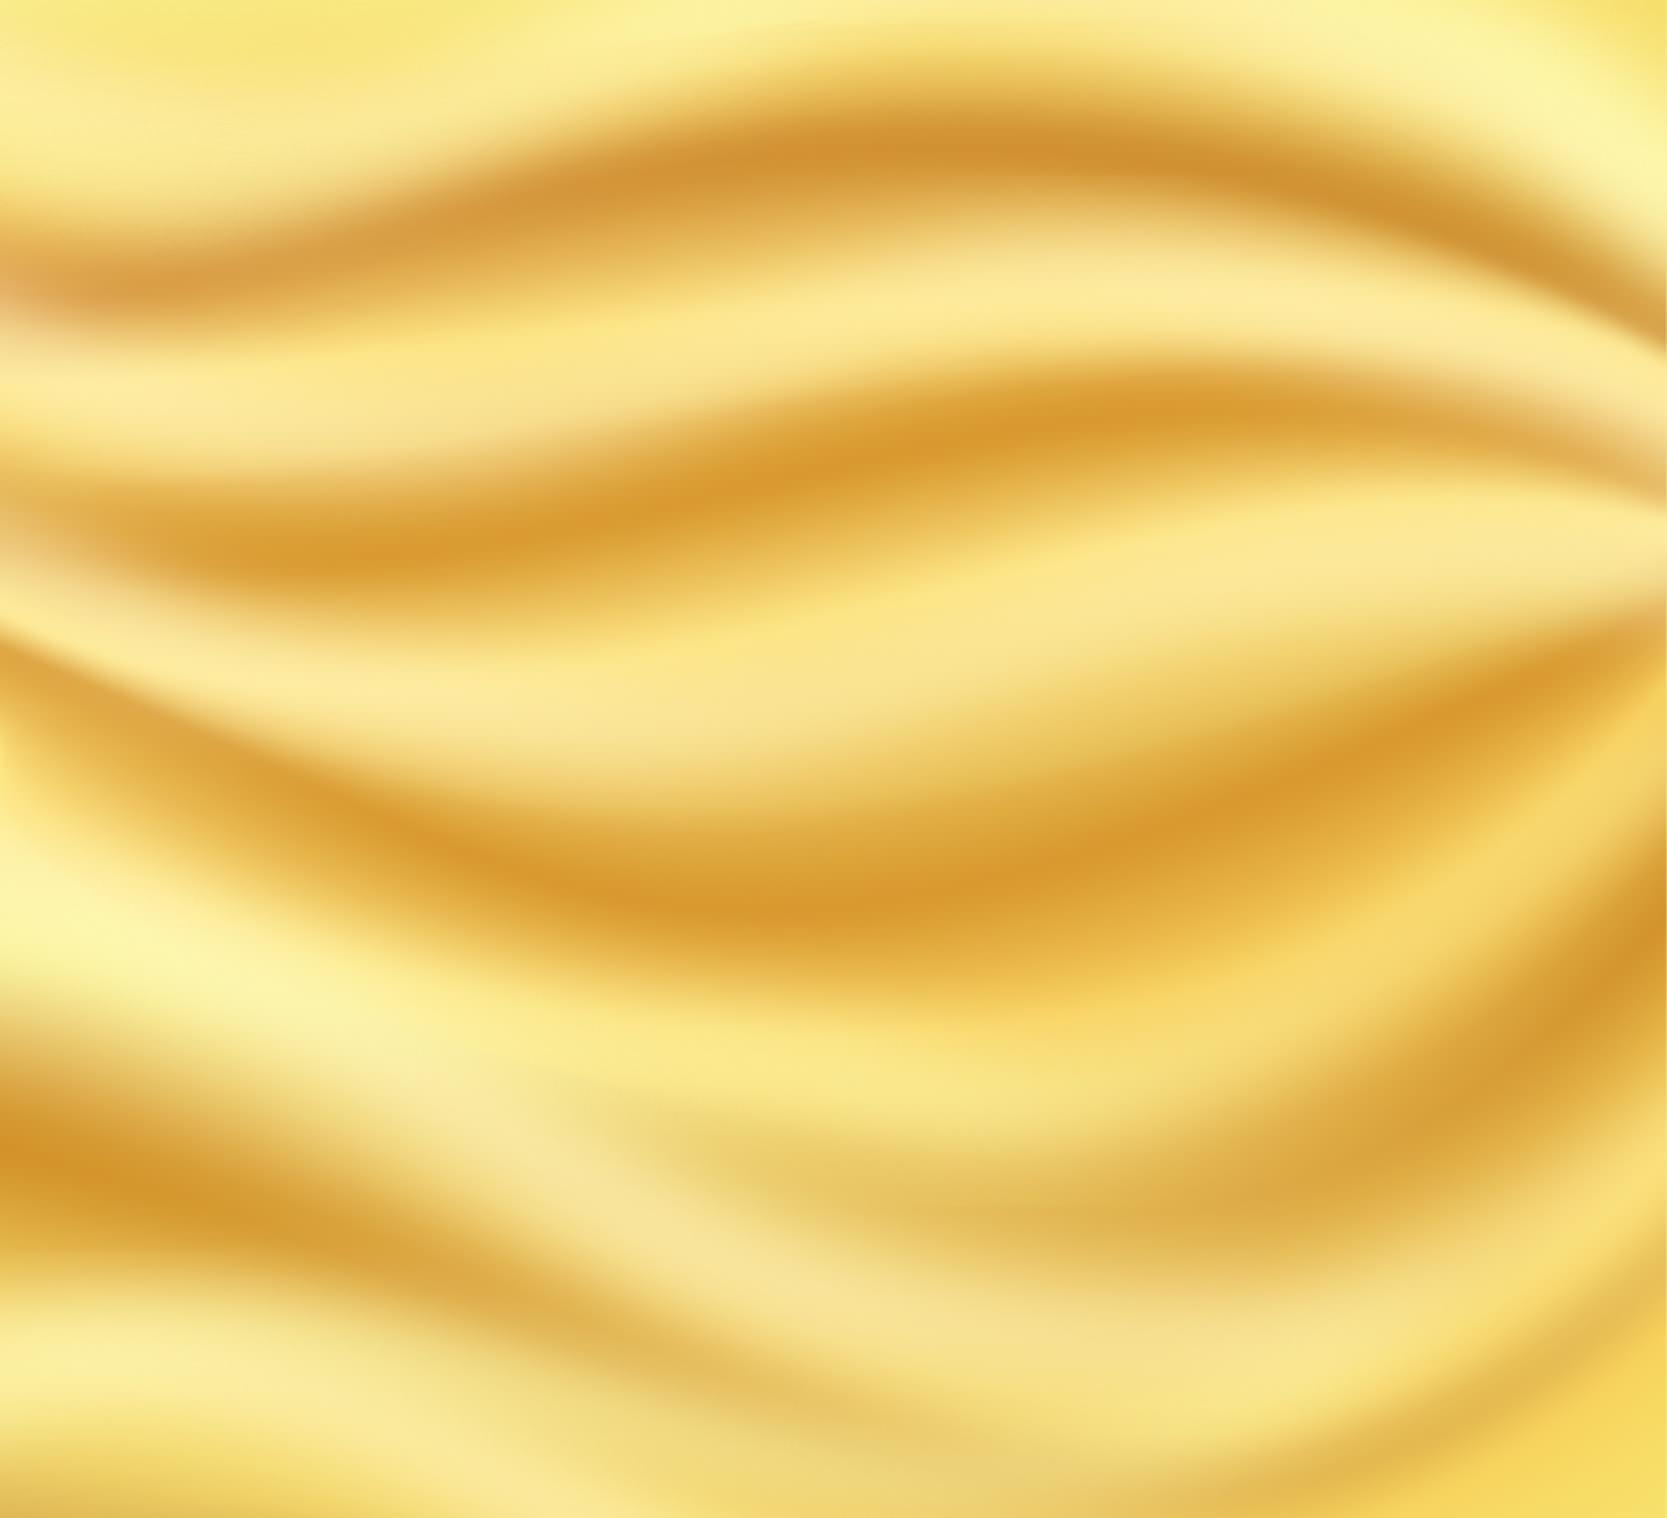 gold satin background - photo #13